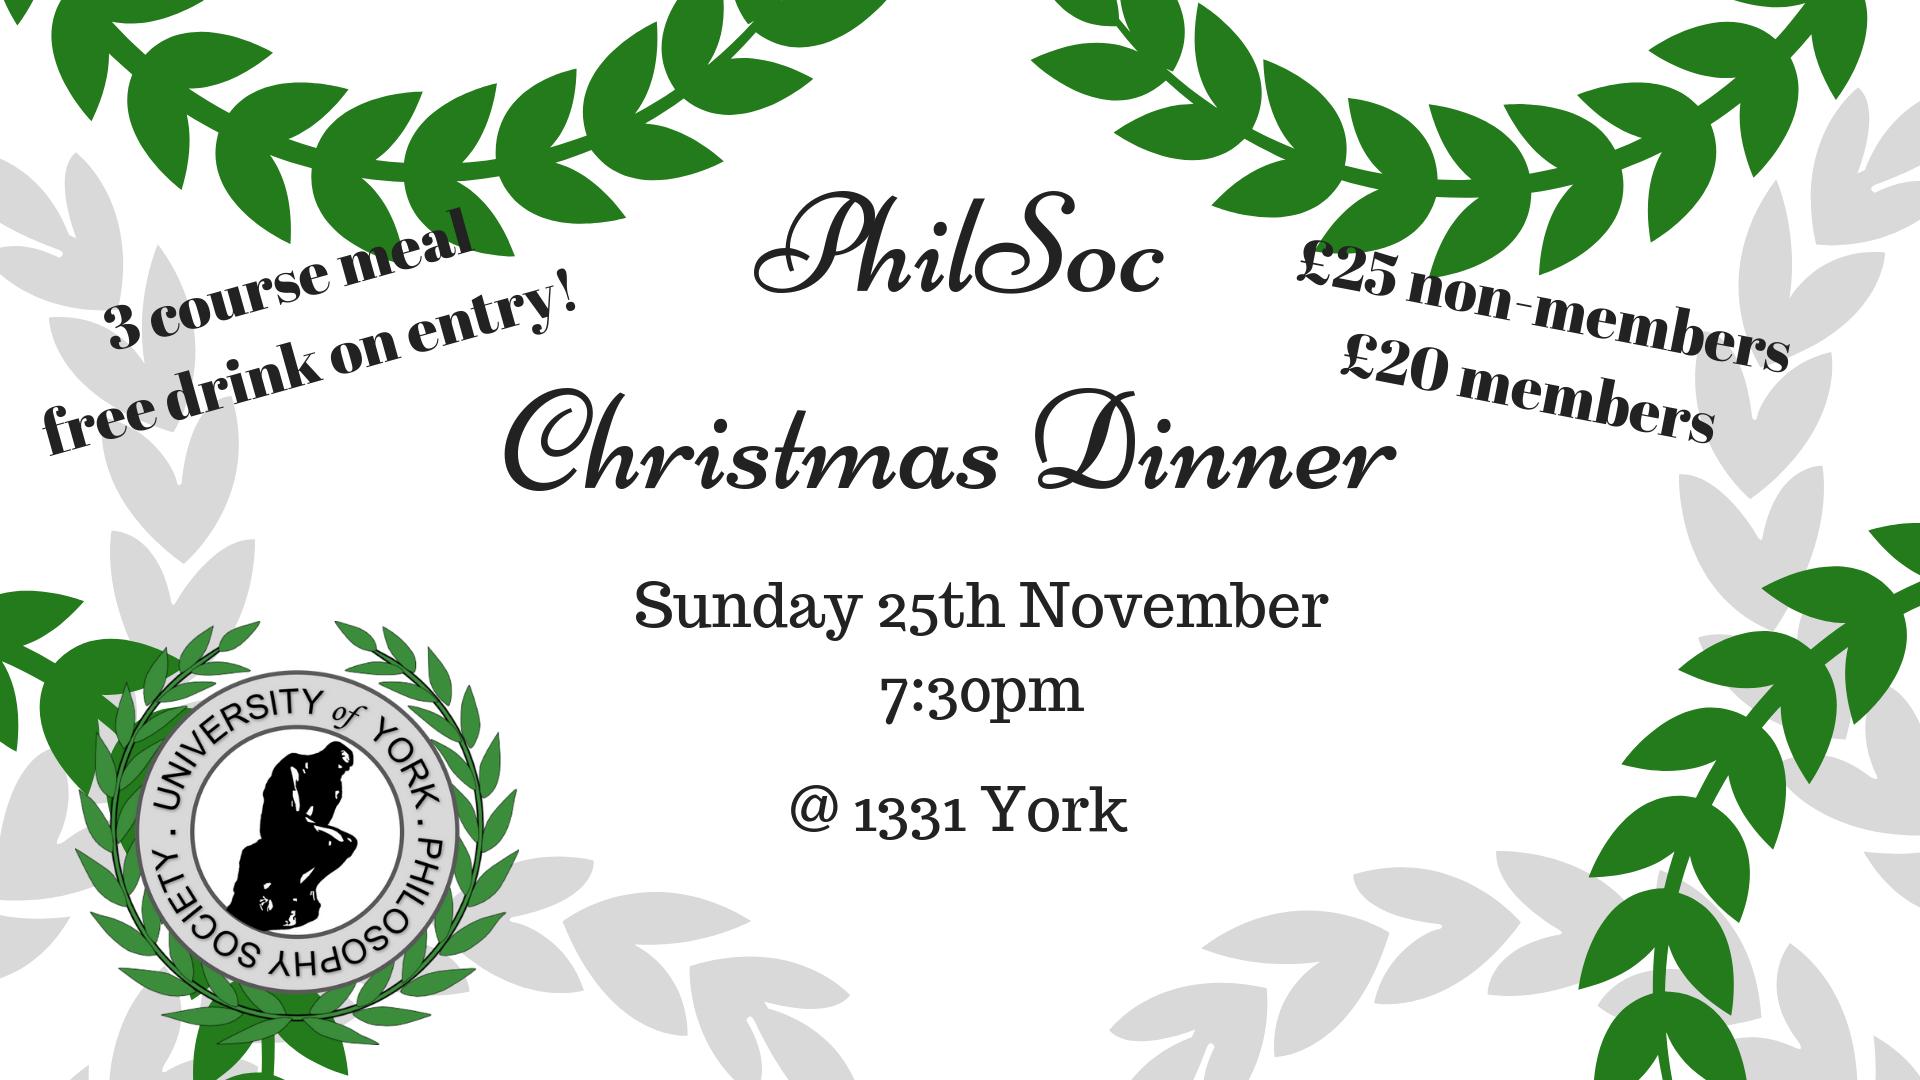 PhilSoc Christmas Dinner